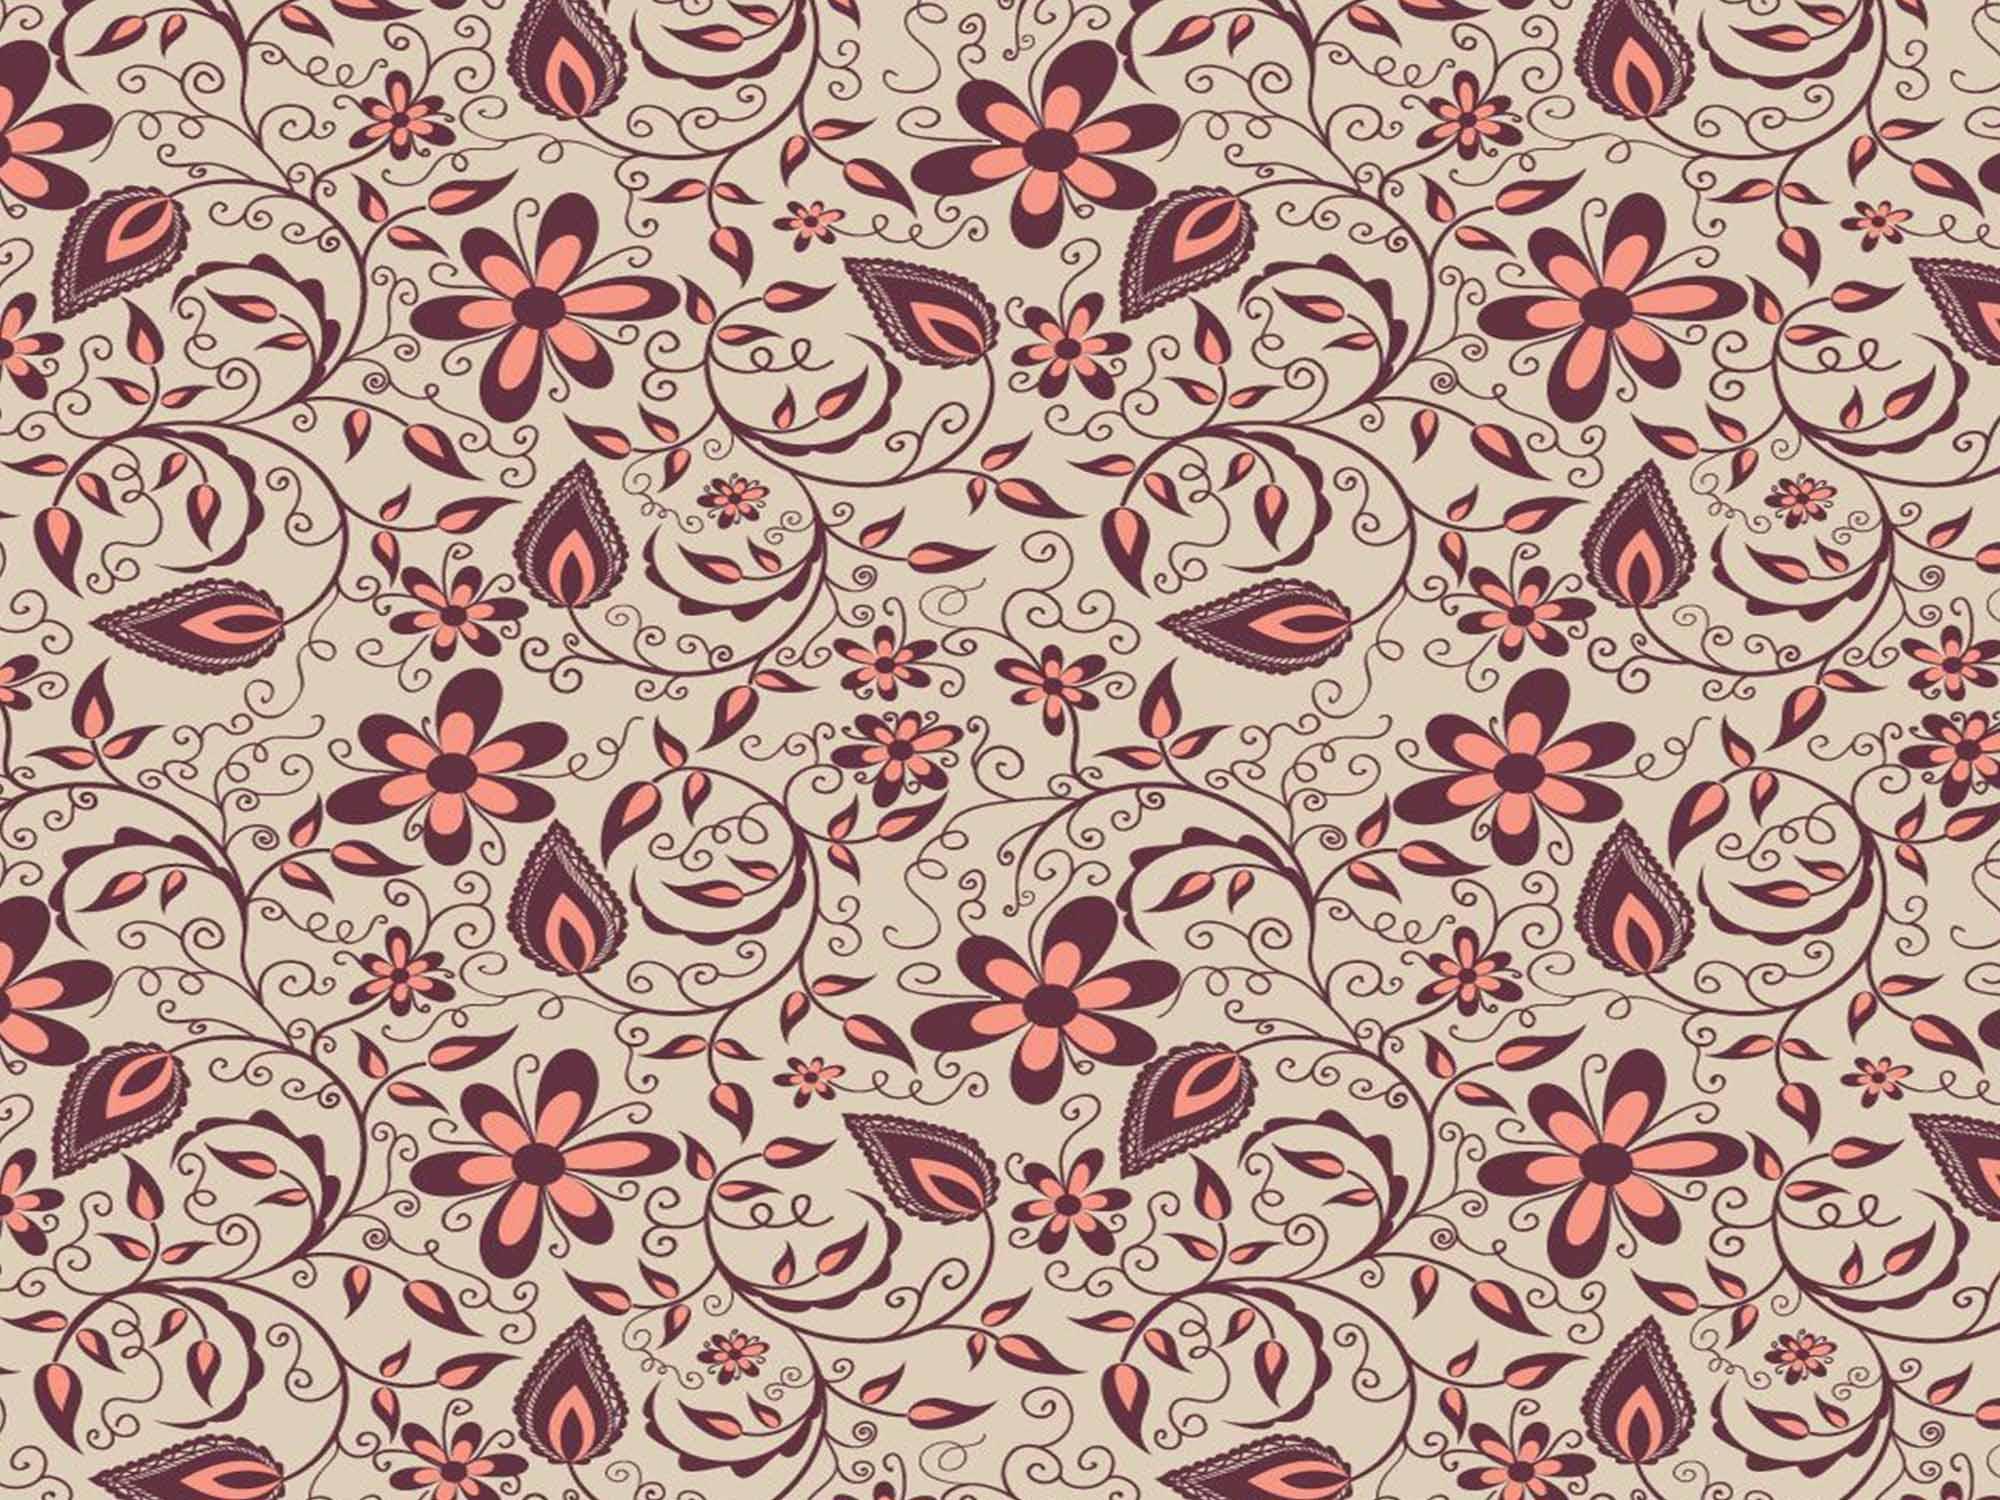 Papel de Parede Floral 0102 - Adesivos de Parede  - Paredes Decoradas